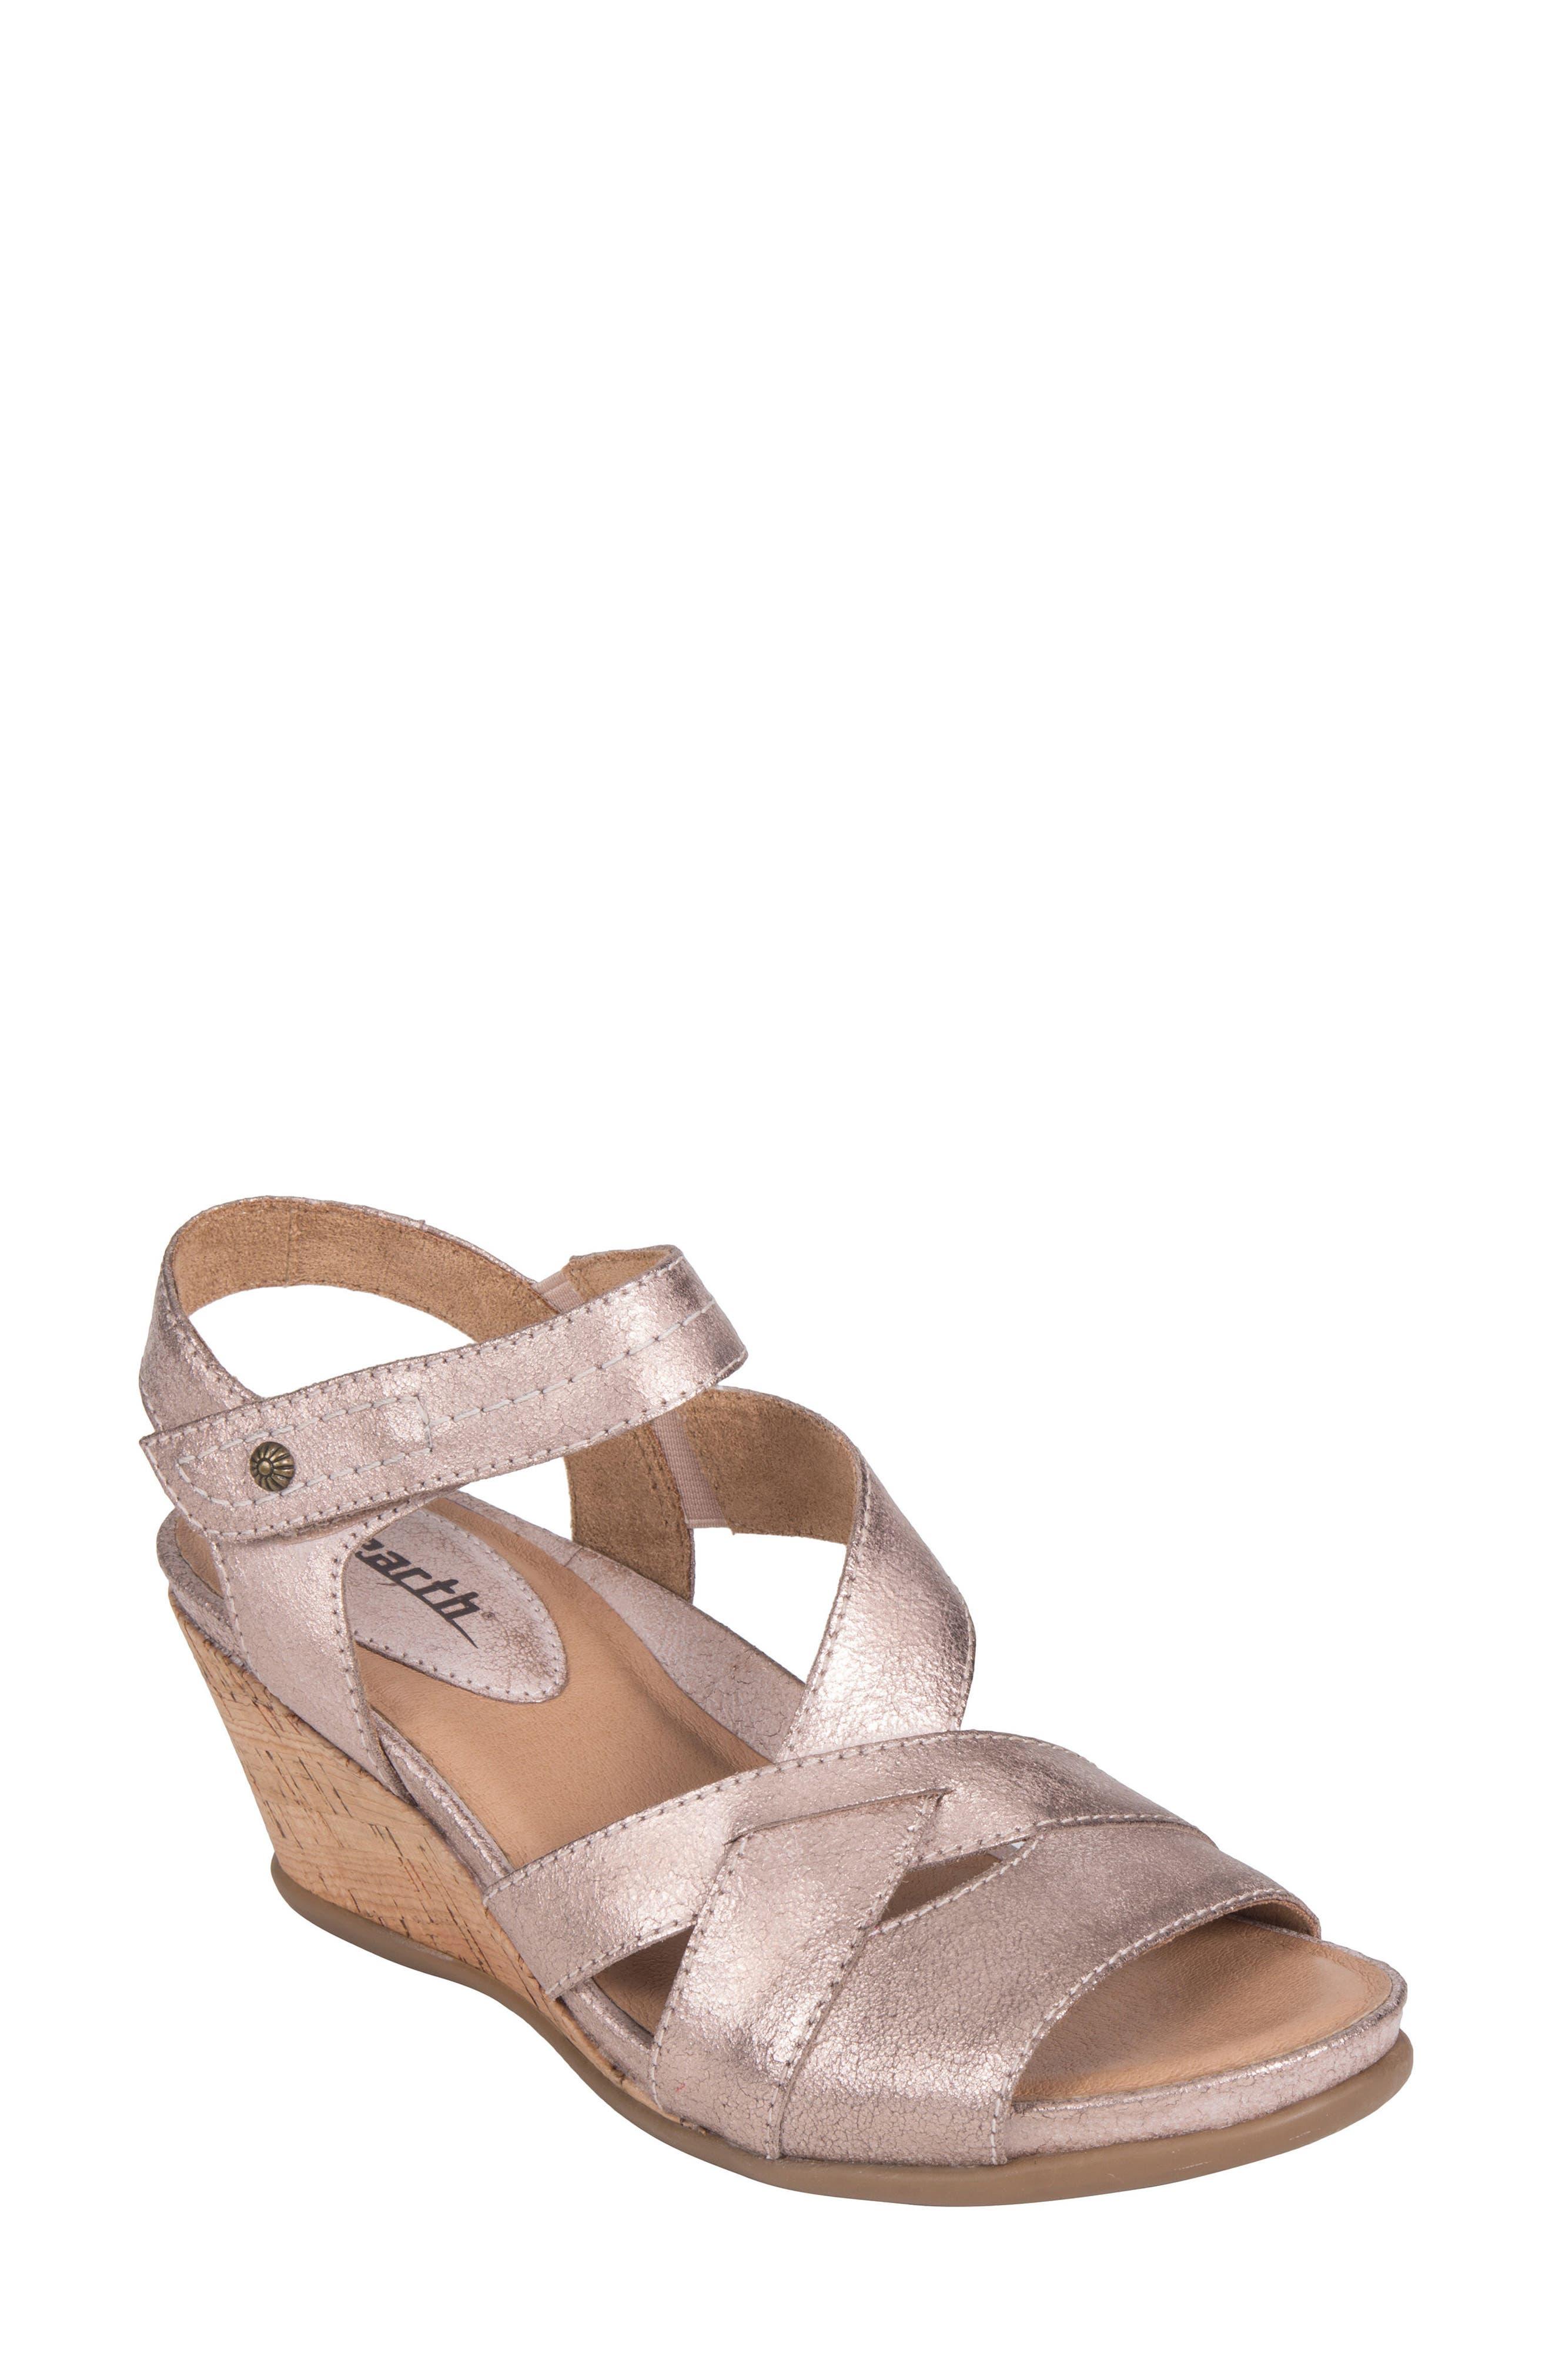 Thistle Wedge Sandal,                             Main thumbnail 4, color,